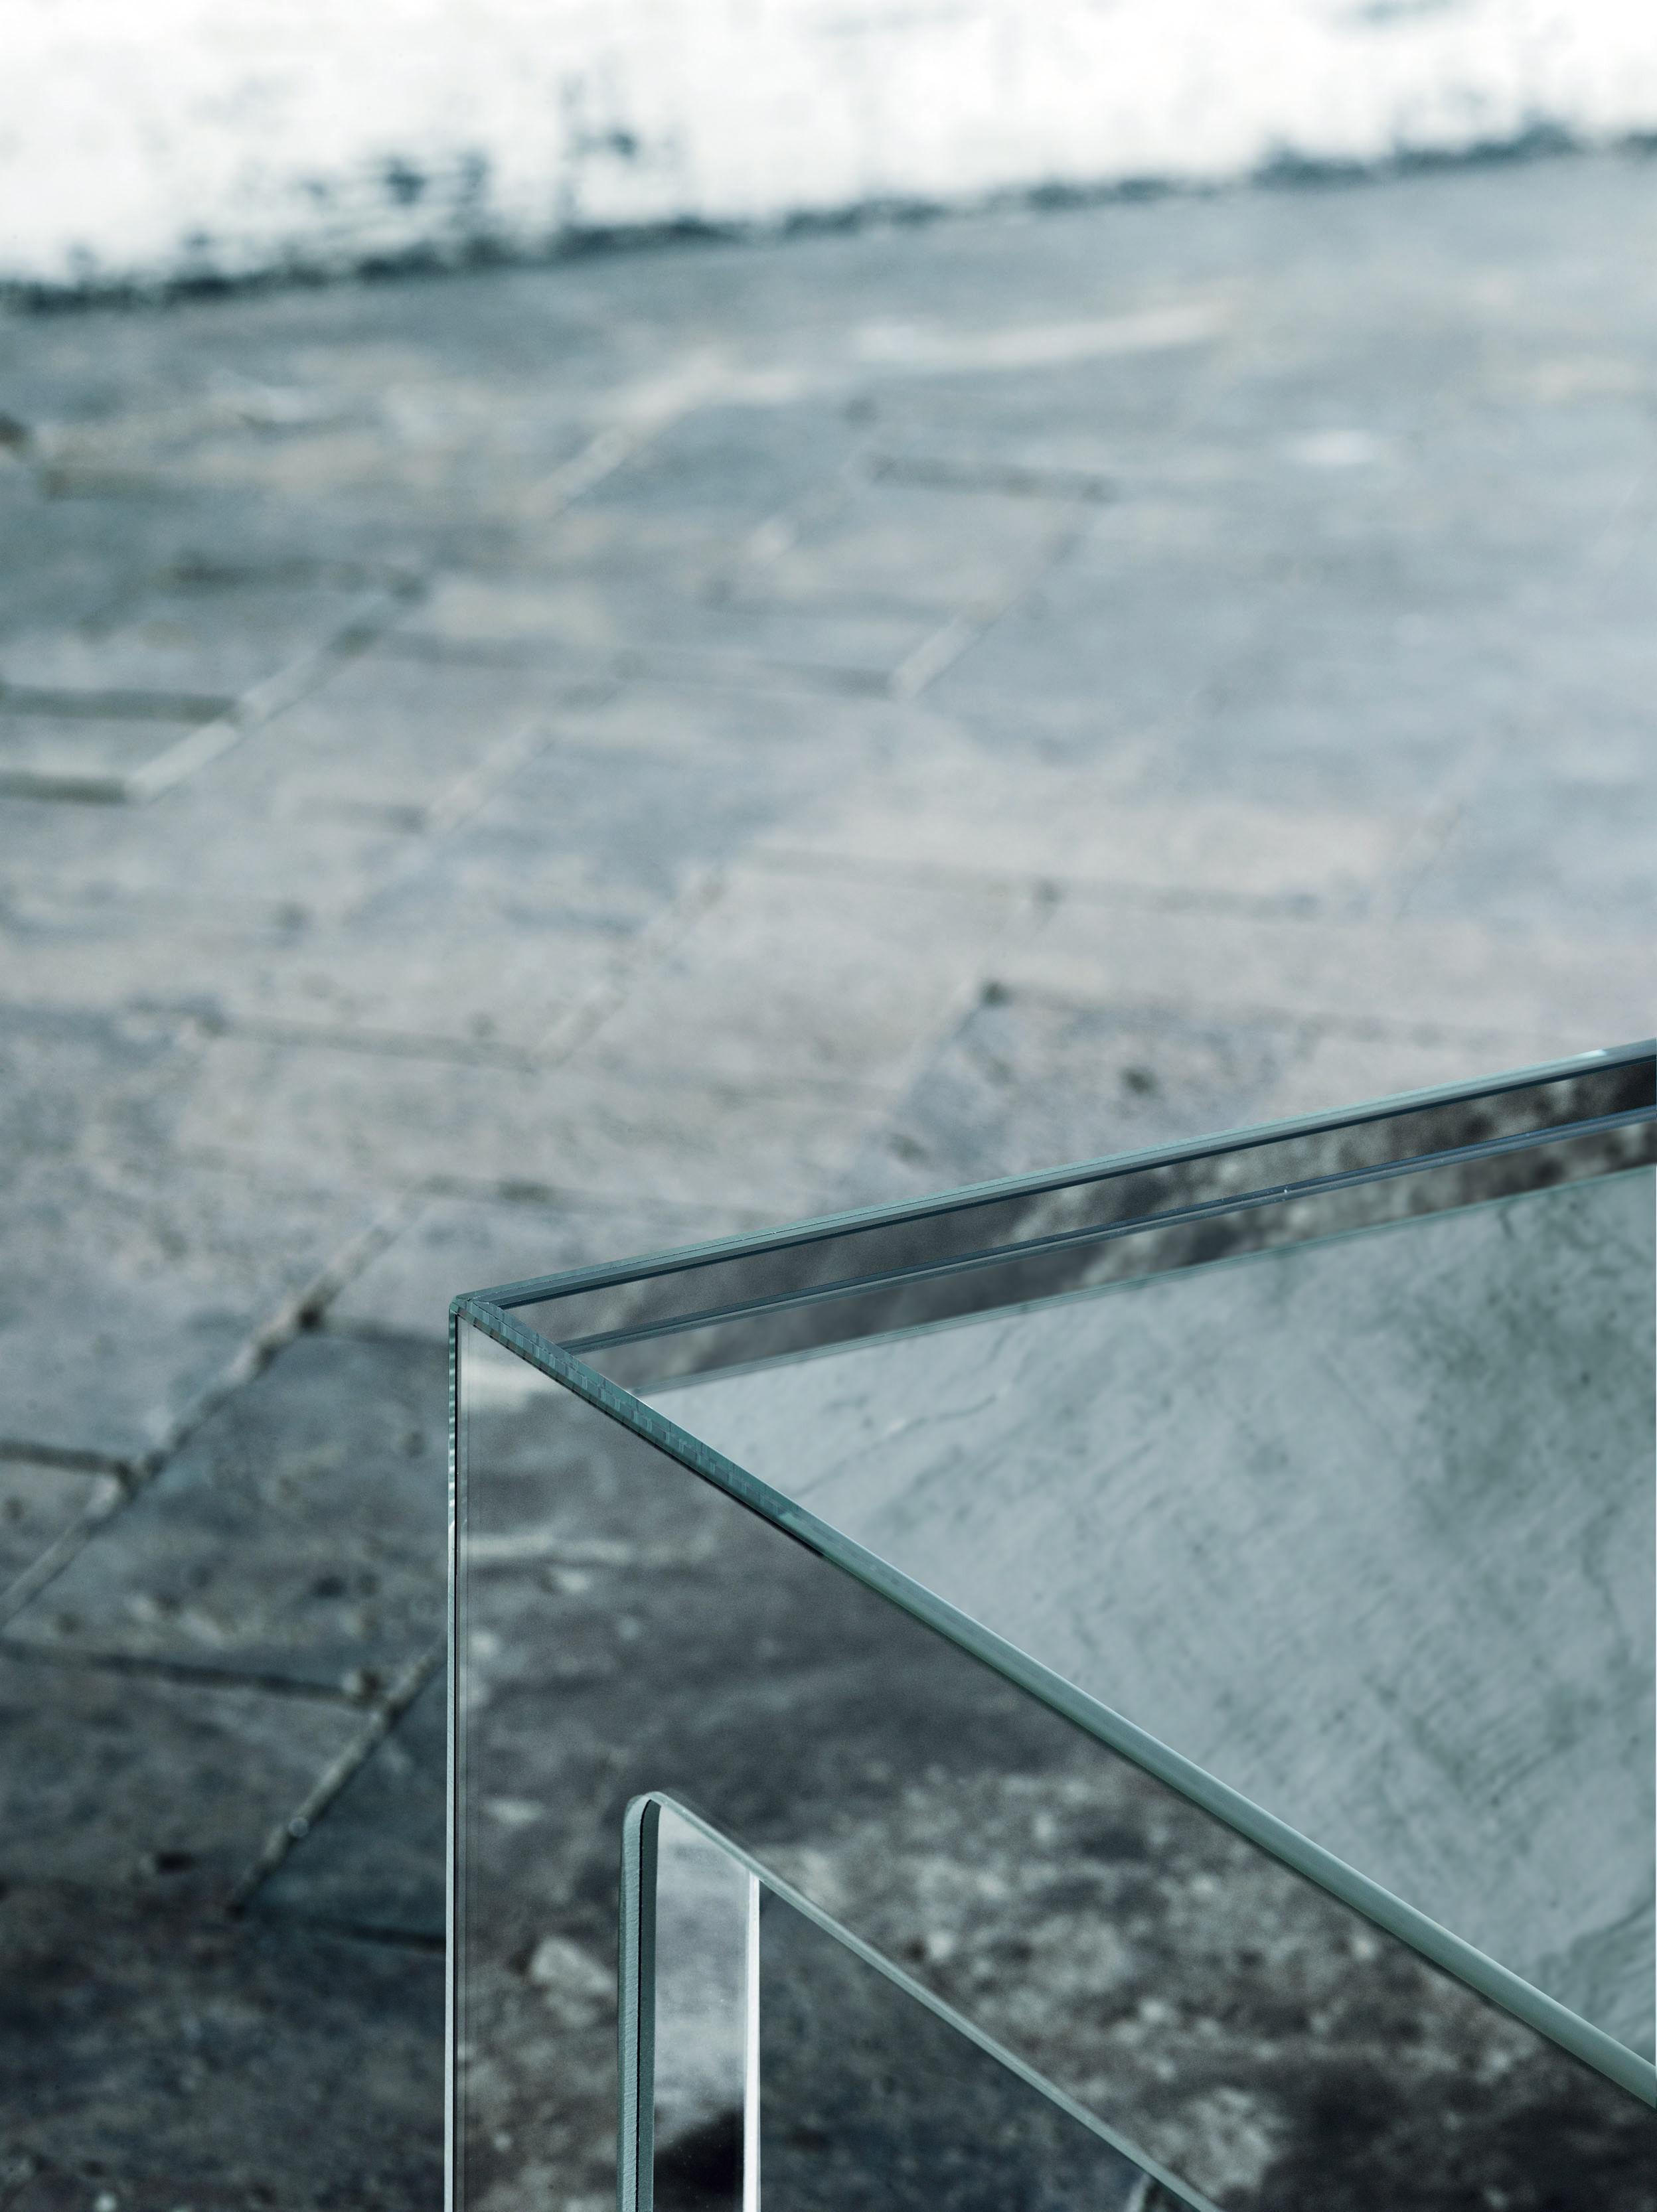 Table basse mirror mirror 130 x 70 cm miroir glas italia for Miroir 90 x 130